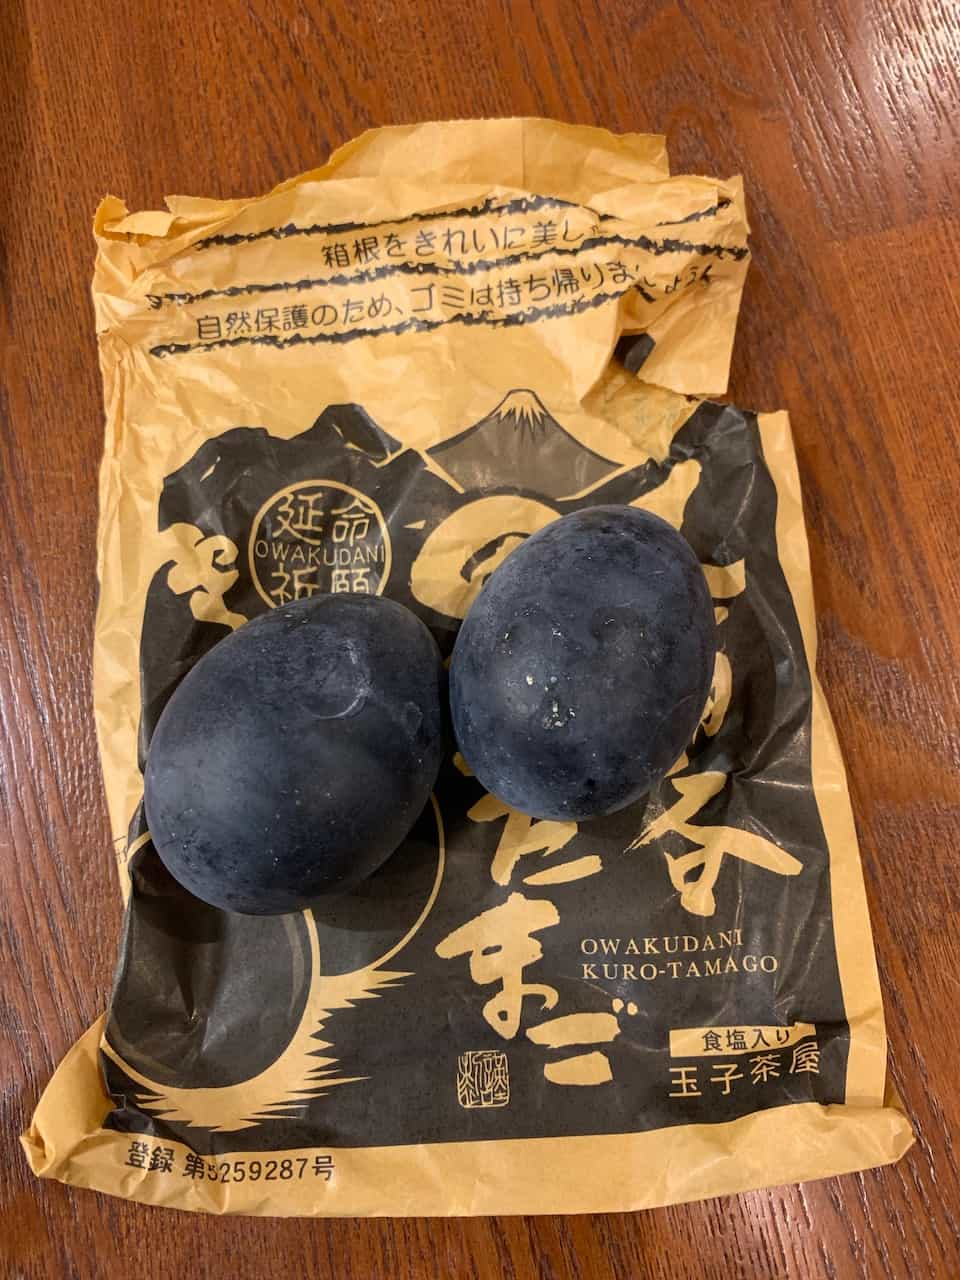 Black Eggs Owakudani